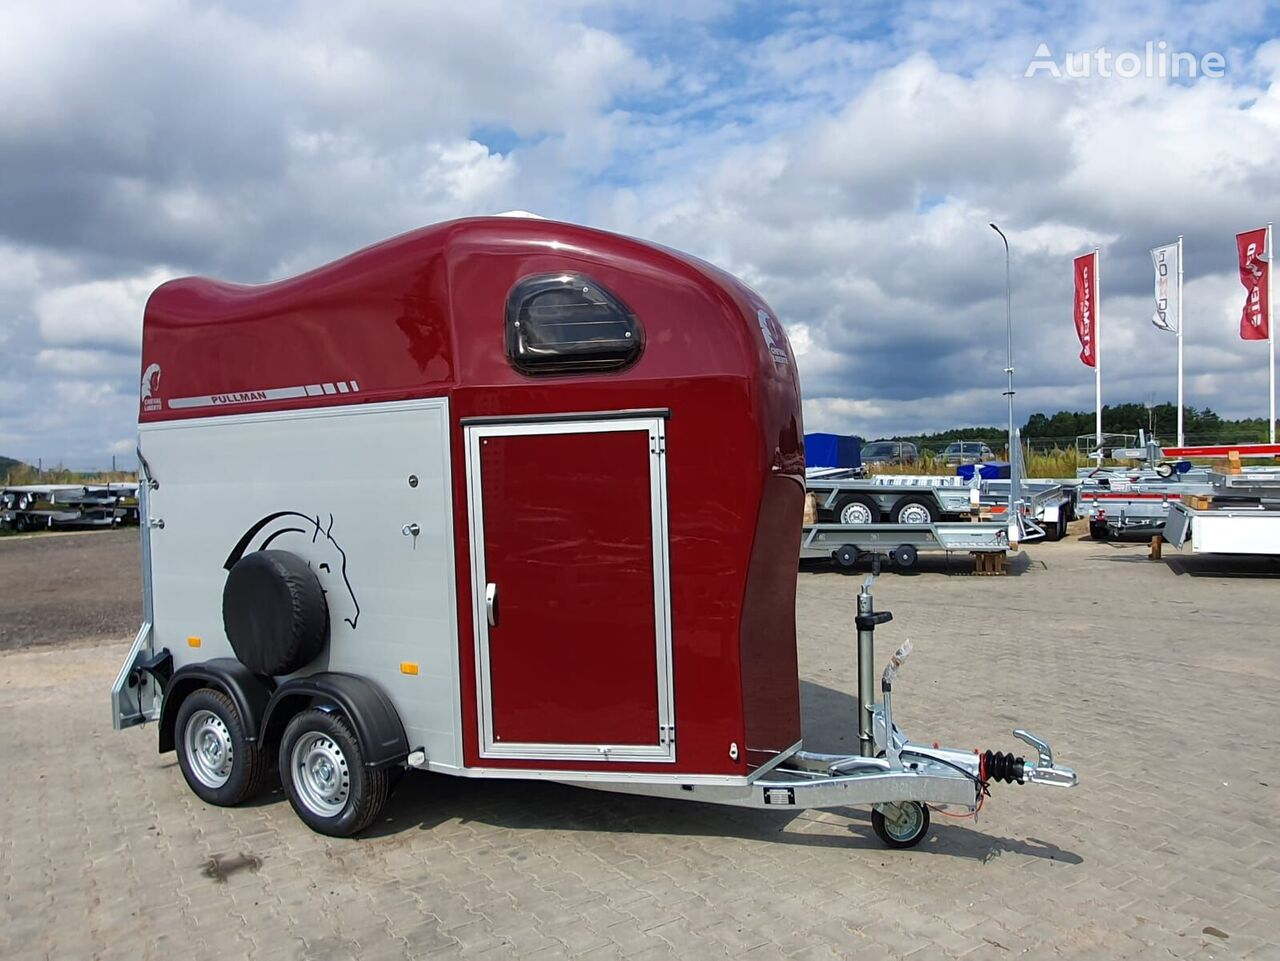 remolque de caballos Cheval liberte Gold 1 one horse trailer nuevo